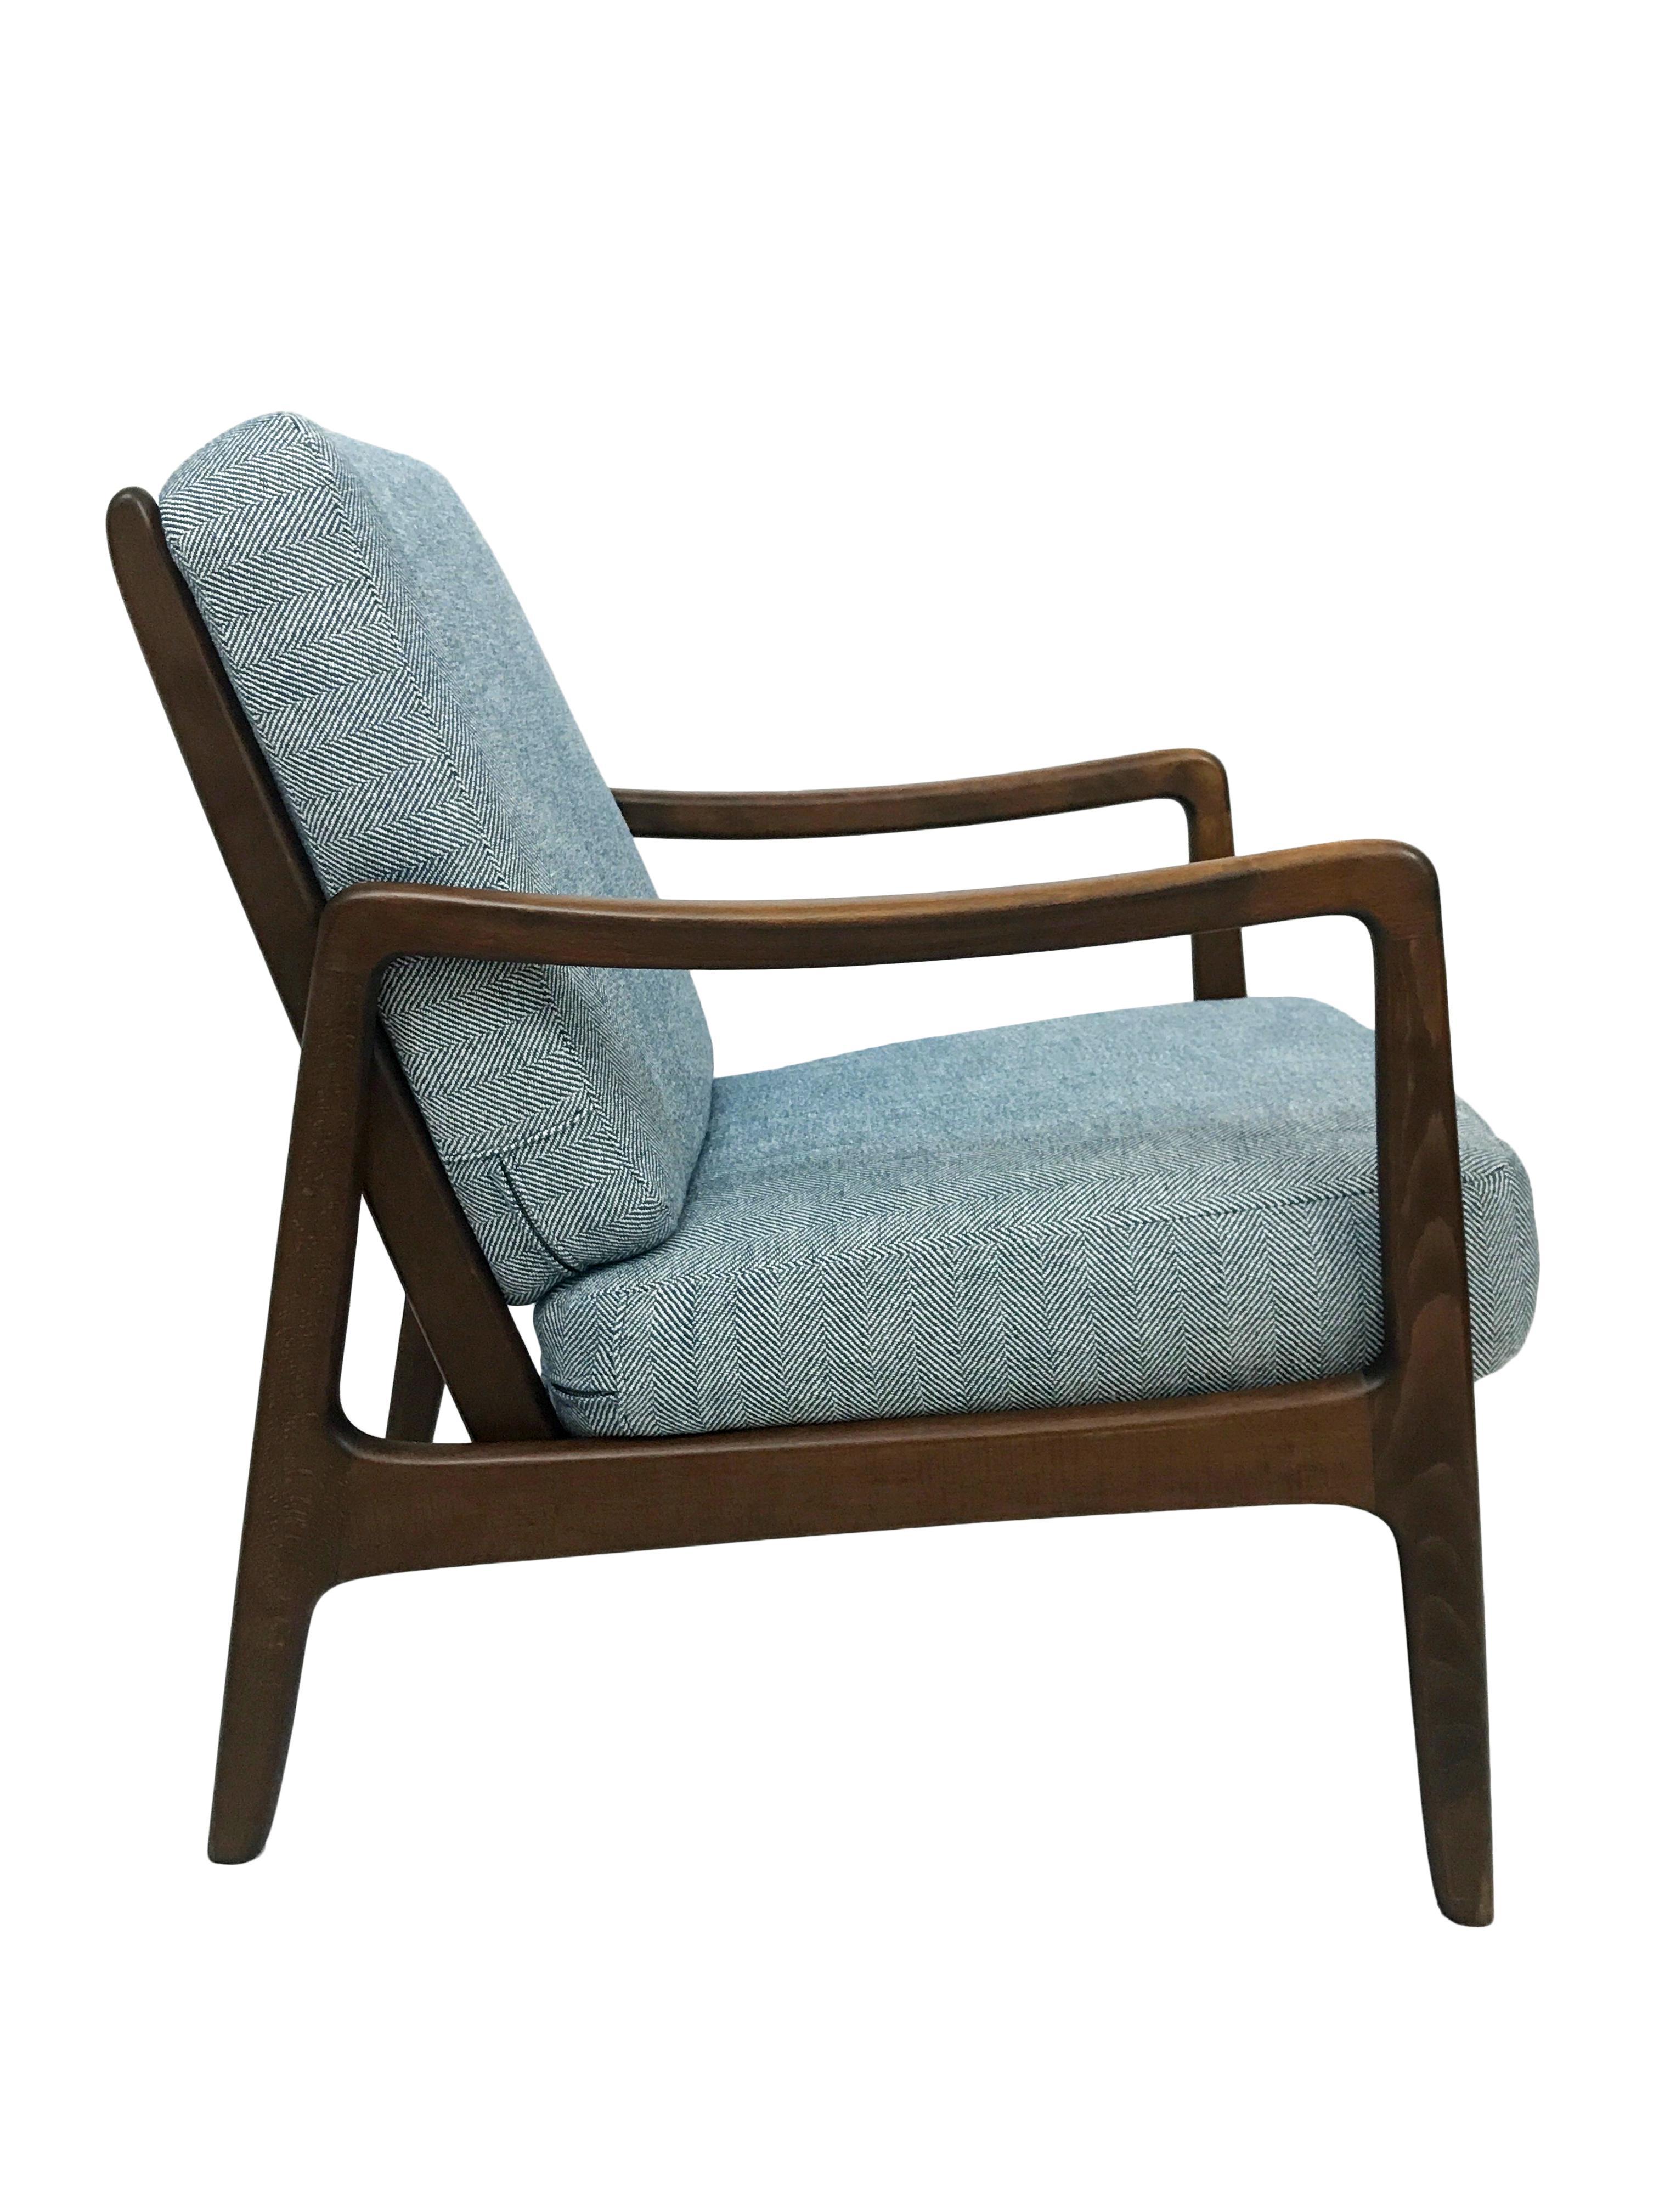 Danish Modern France U0026 Daverkosen Mid Century Herringbone Lounge Chair By  Ole Wanscher Model 109 For